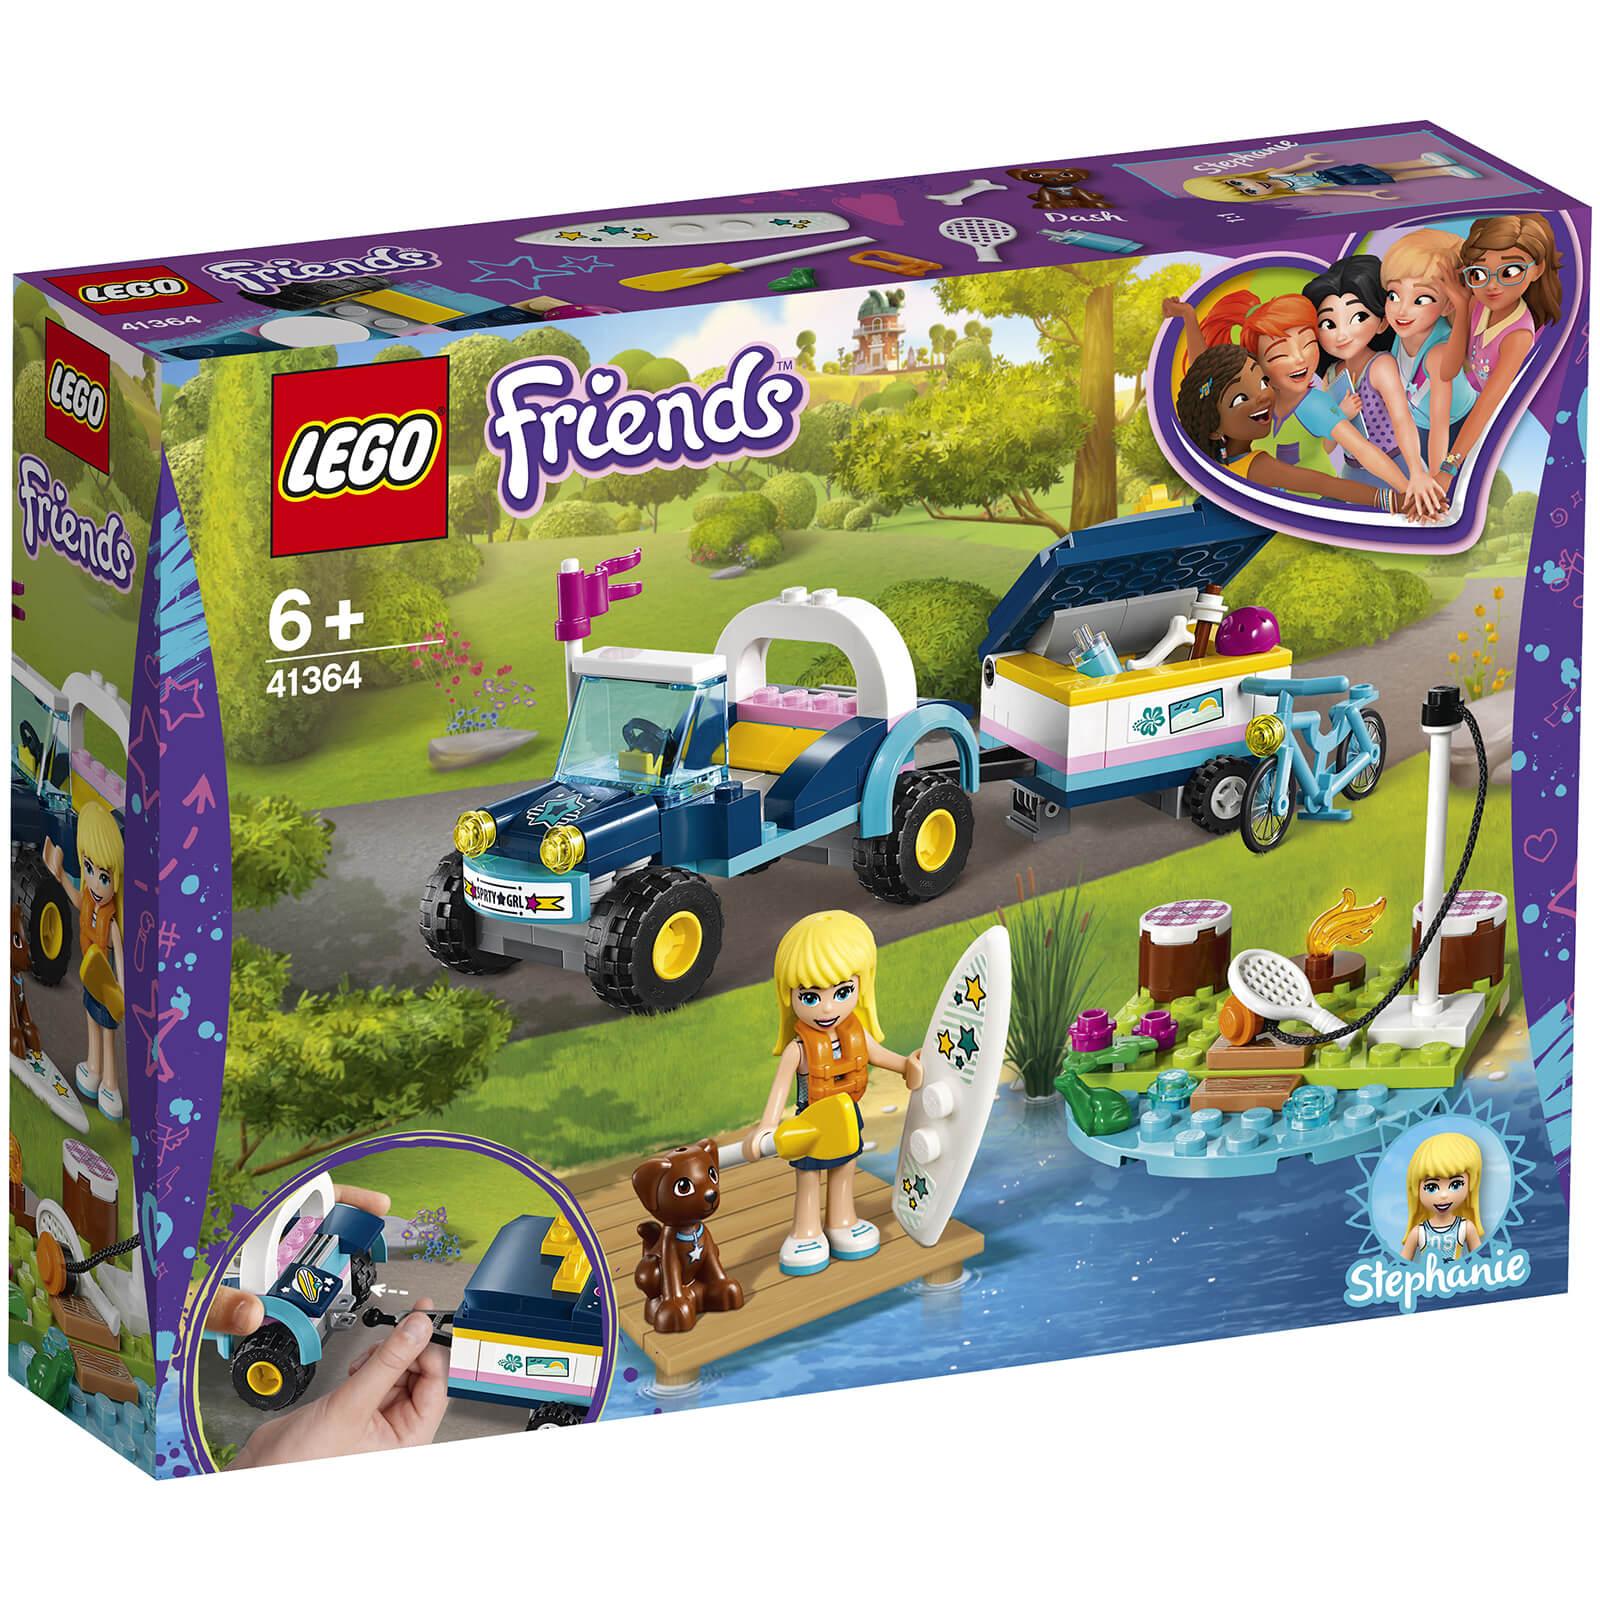 Lego Friends: Stephanie's Buggy and Trailer (41364)